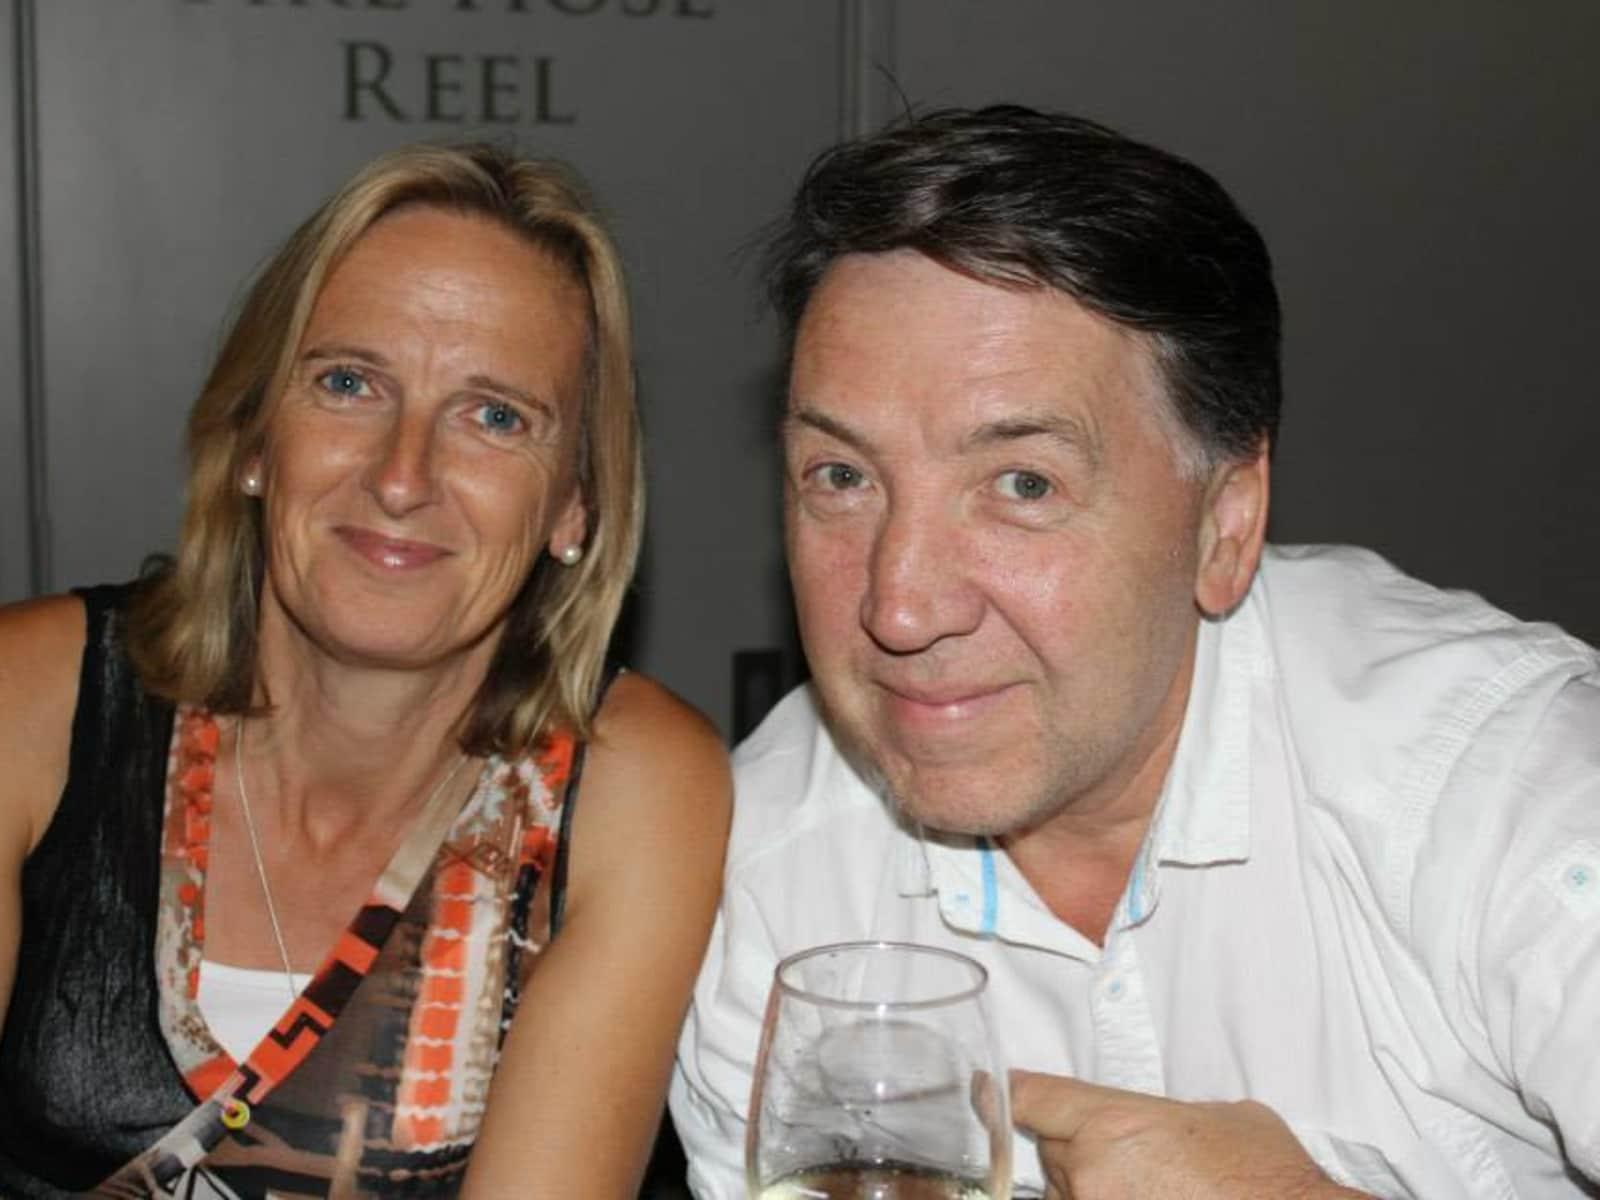 Sharon & David from Perth, Western Australia, Australia